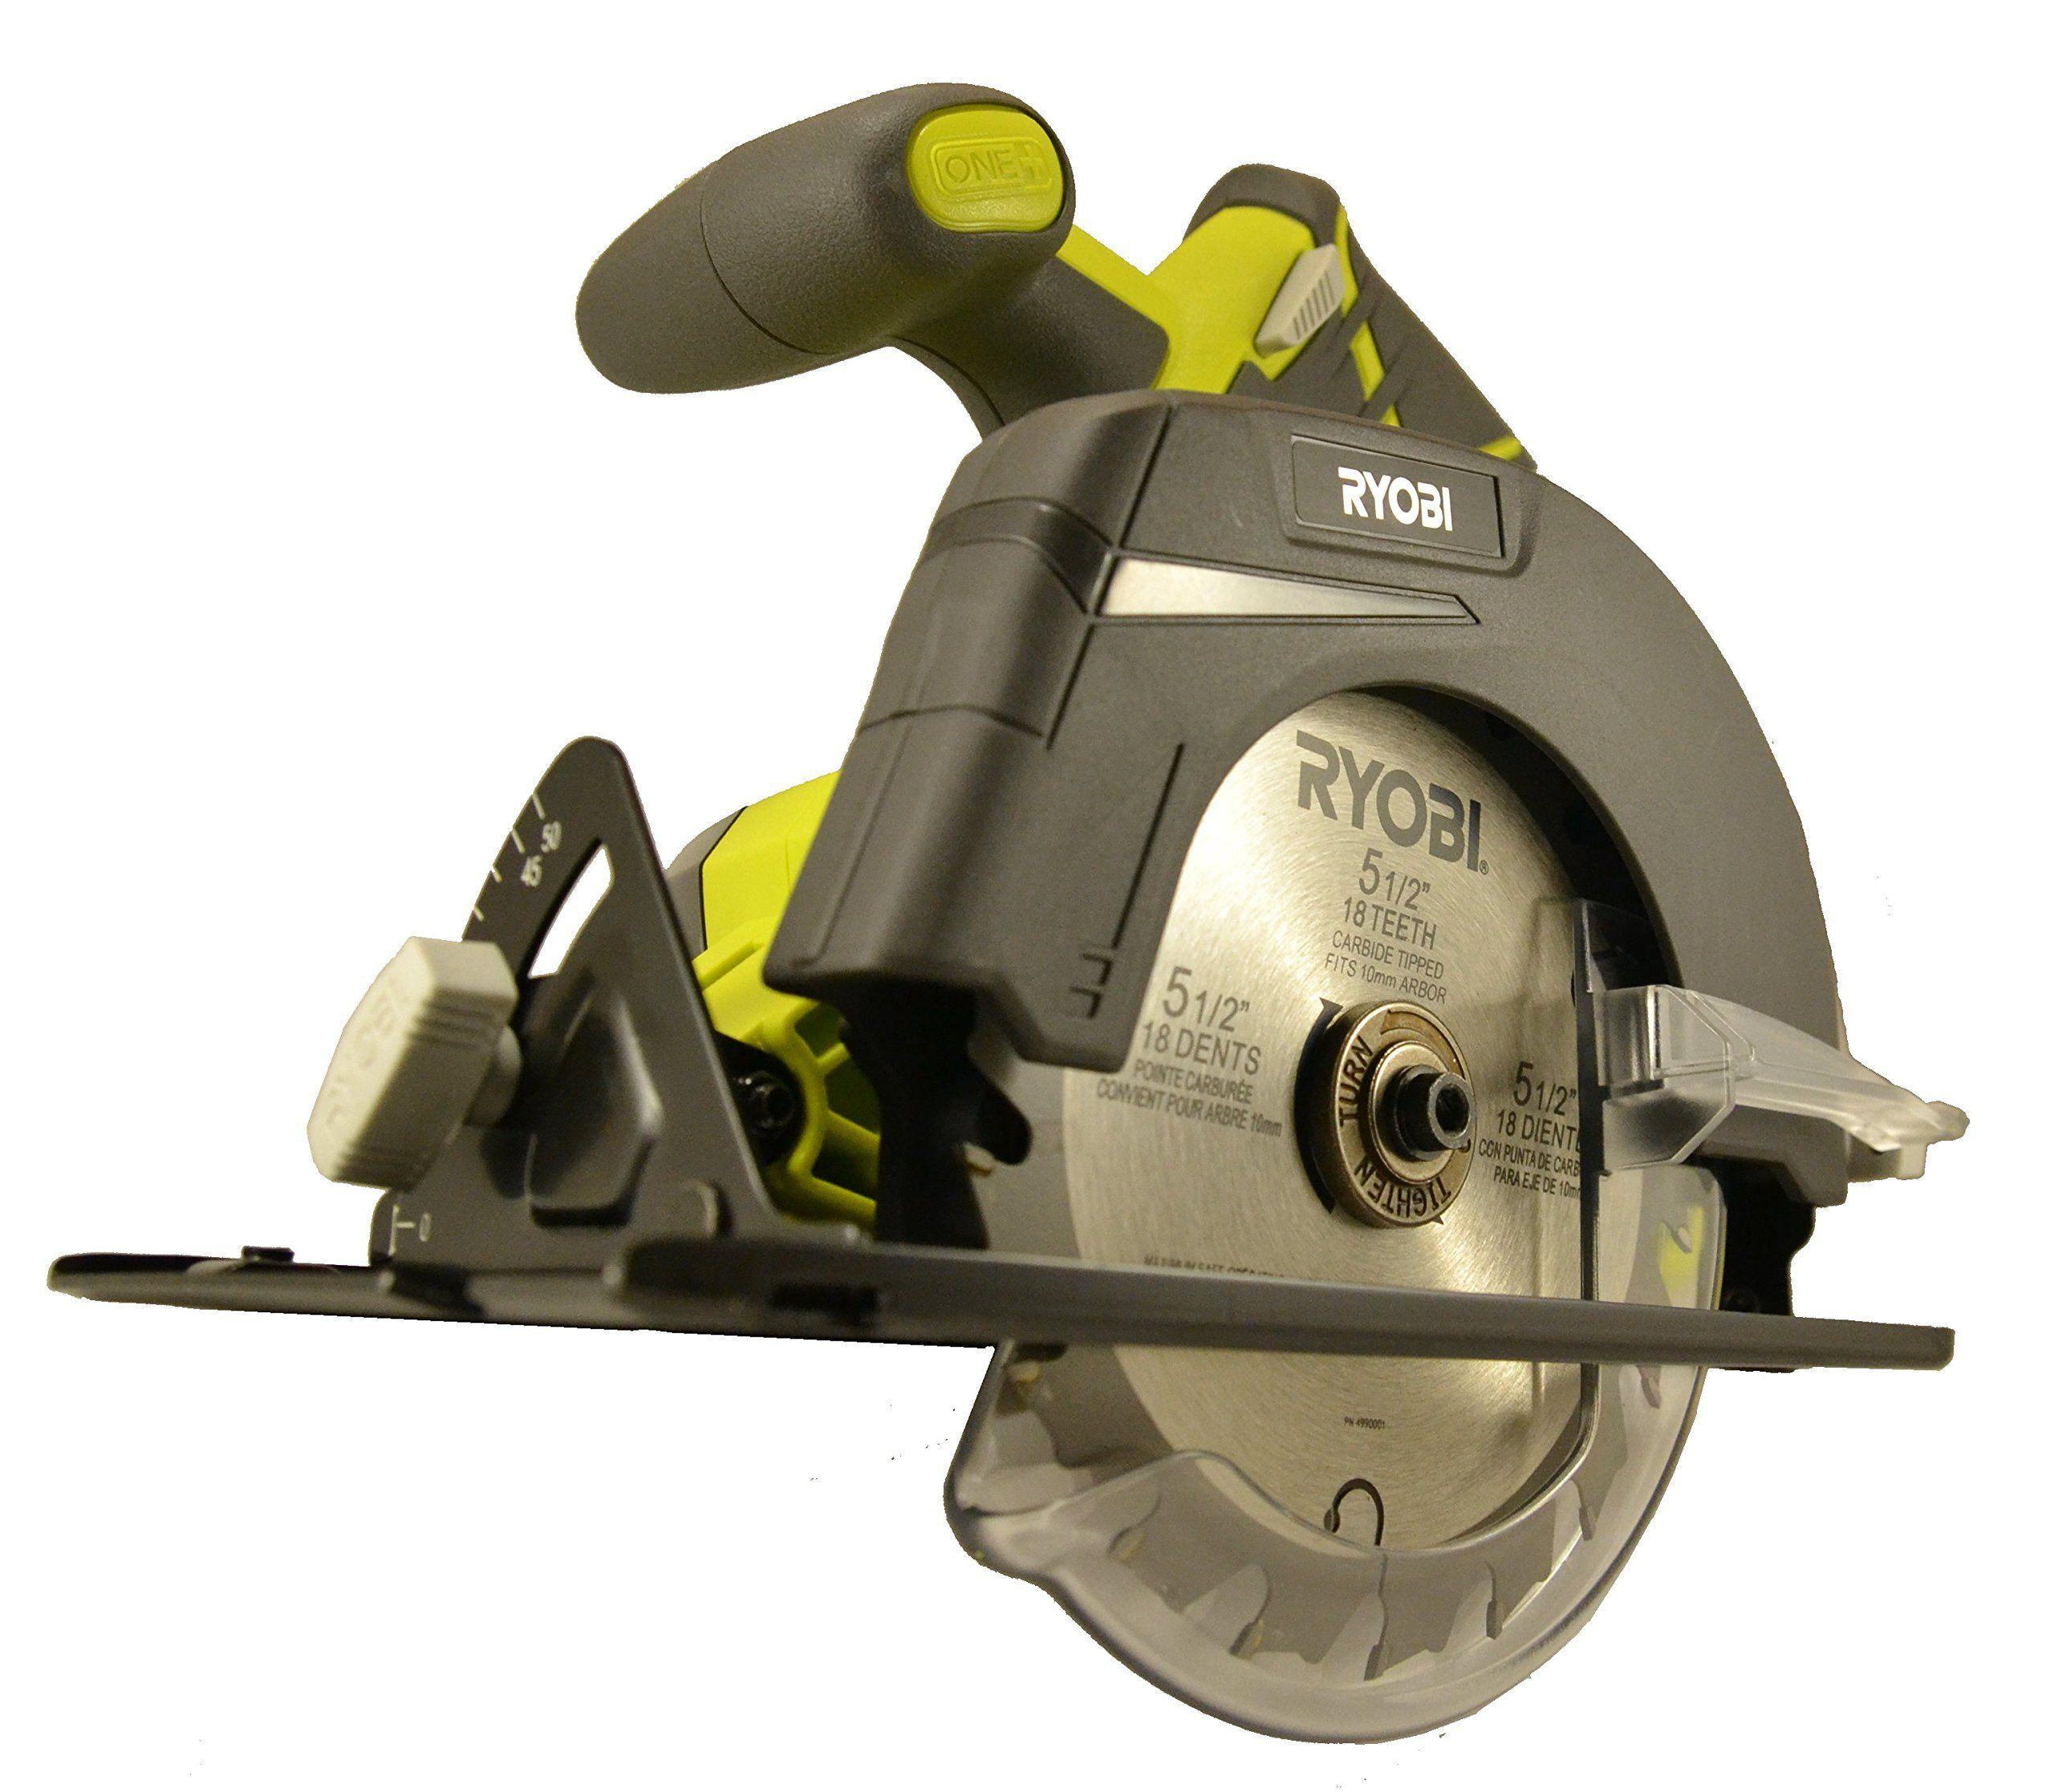 Ryobi Tool Kit Bundle Includes 4 18Volt ONE LithiumIon Cordless Power Tools Cha Ryobi Tool Kit Bundle Includes 4 18Volt ONE LithiumIon Cordless Power Tools Charger 2 Batt...